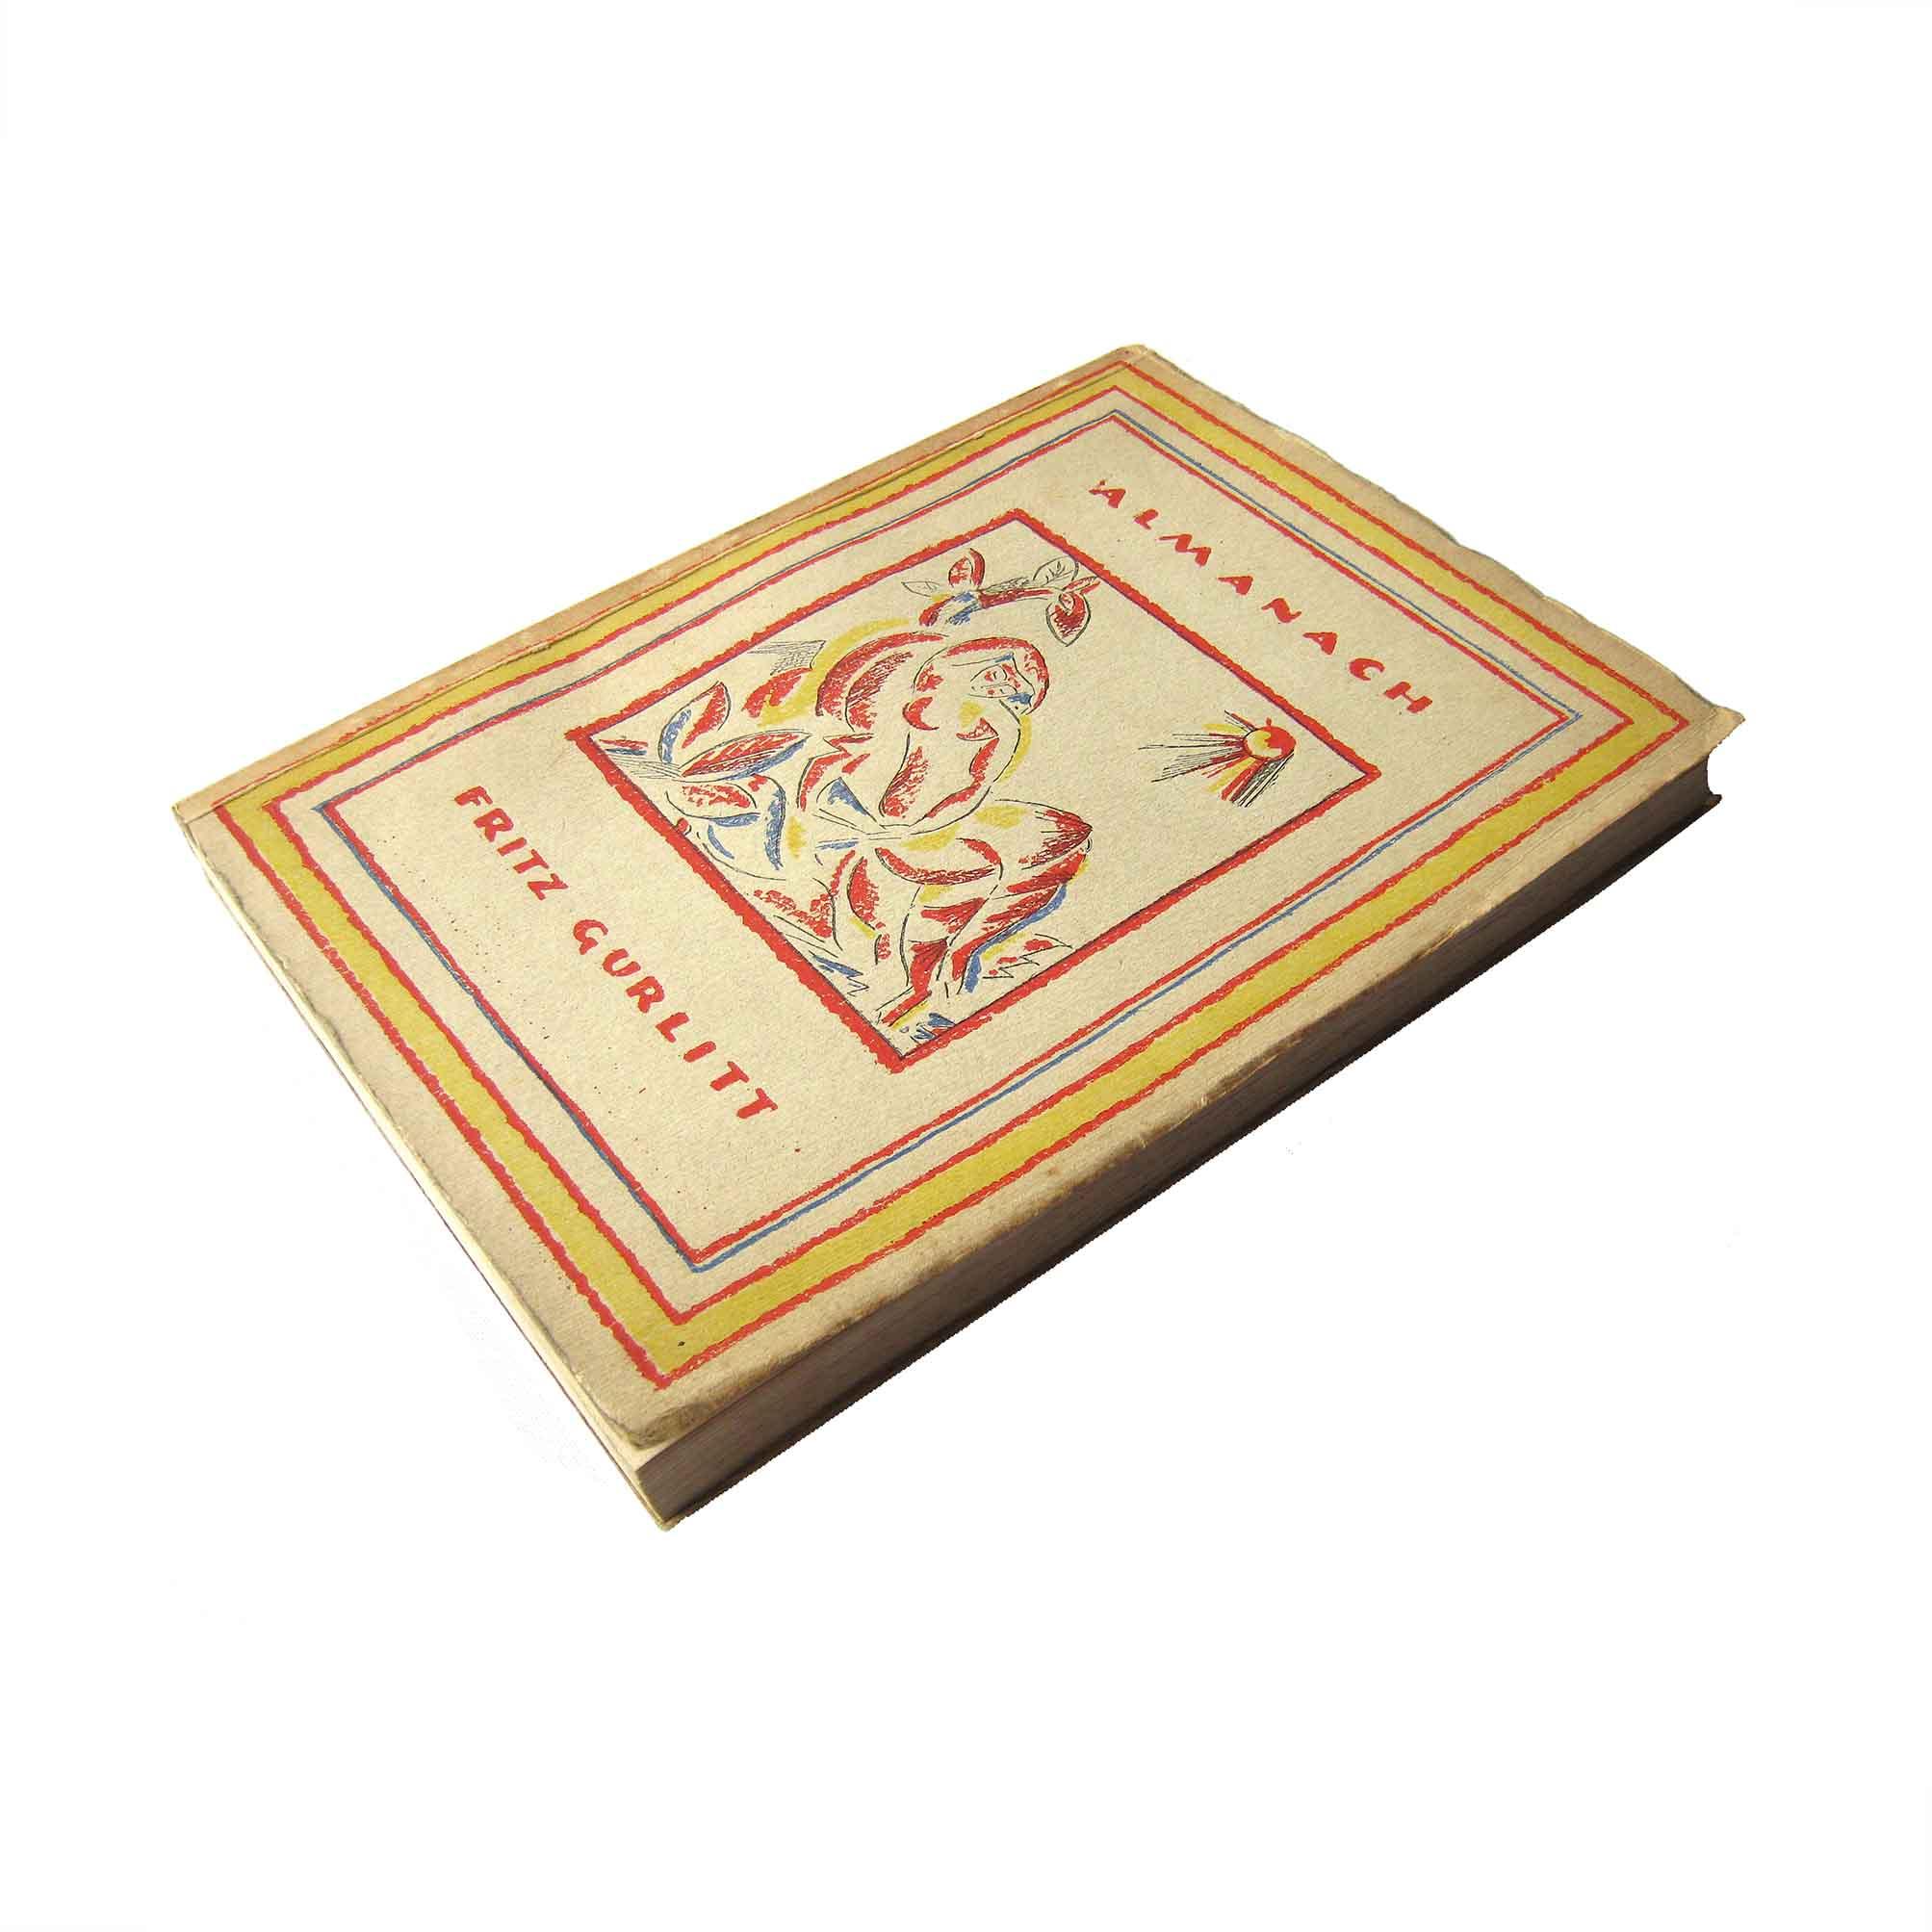 5545-Almanach-Gurlitt-1919-Umschlag-verso-N.jpg